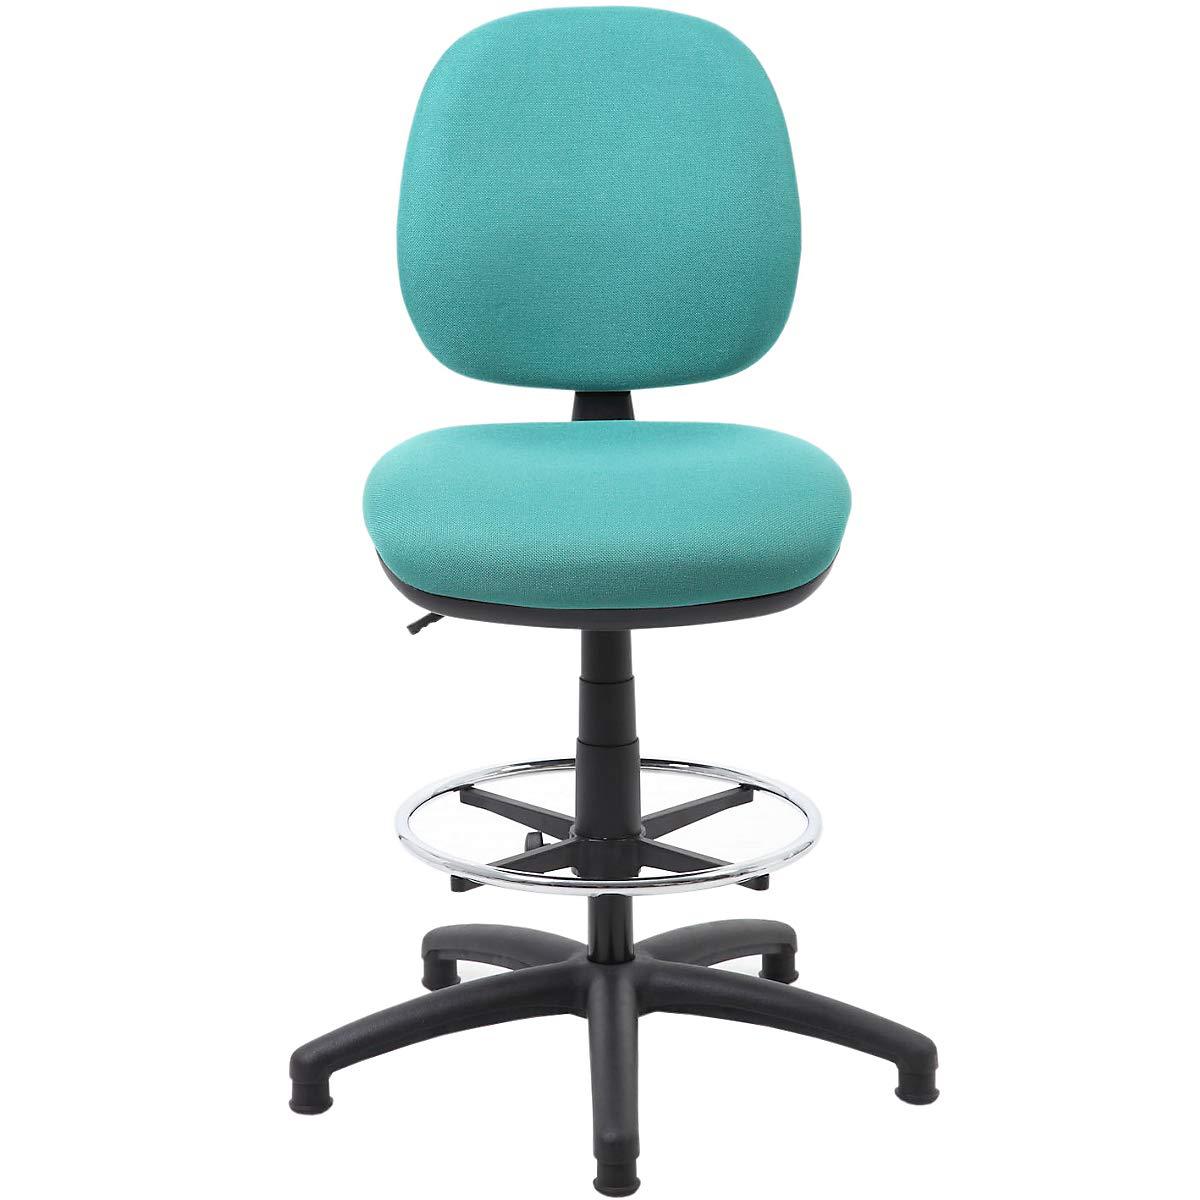 Komfort-Arbeitsdrehstuhl - Bürostuhl mit Stoffbezug - höhenverstellbarer Schreibtischstuhl - hochwertiger Stuhl mit Permanentkontaktmechanismus, grün